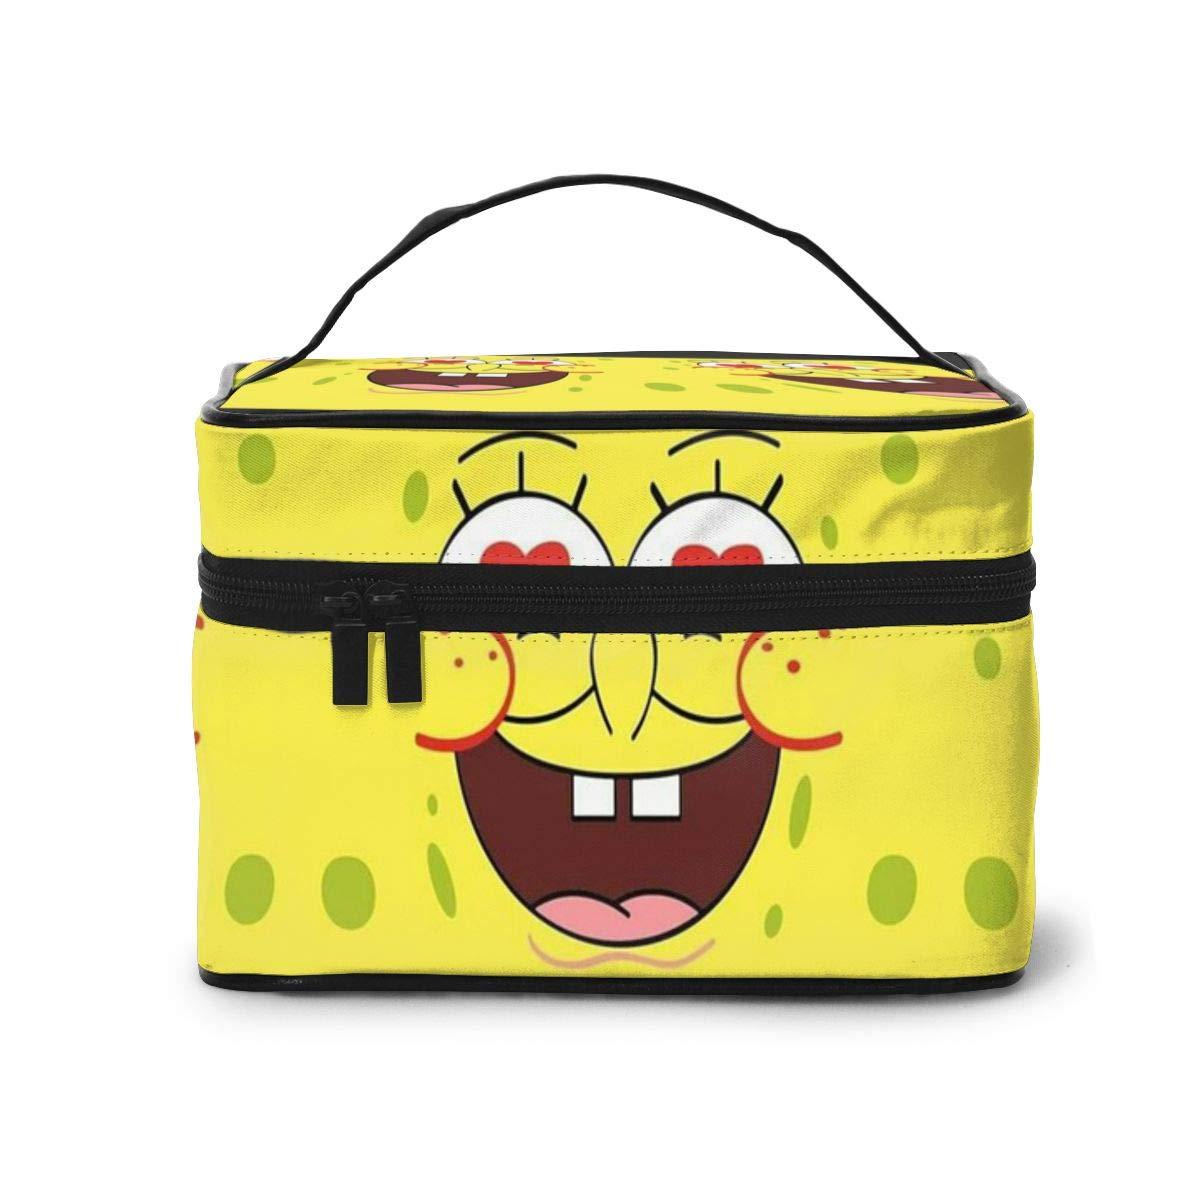 Makeup Bag, Love SpongeBob Travel Portable Cosmetic Bag Large Pouch Mesh Brush Organizer Toiletry Bag for Women Girls